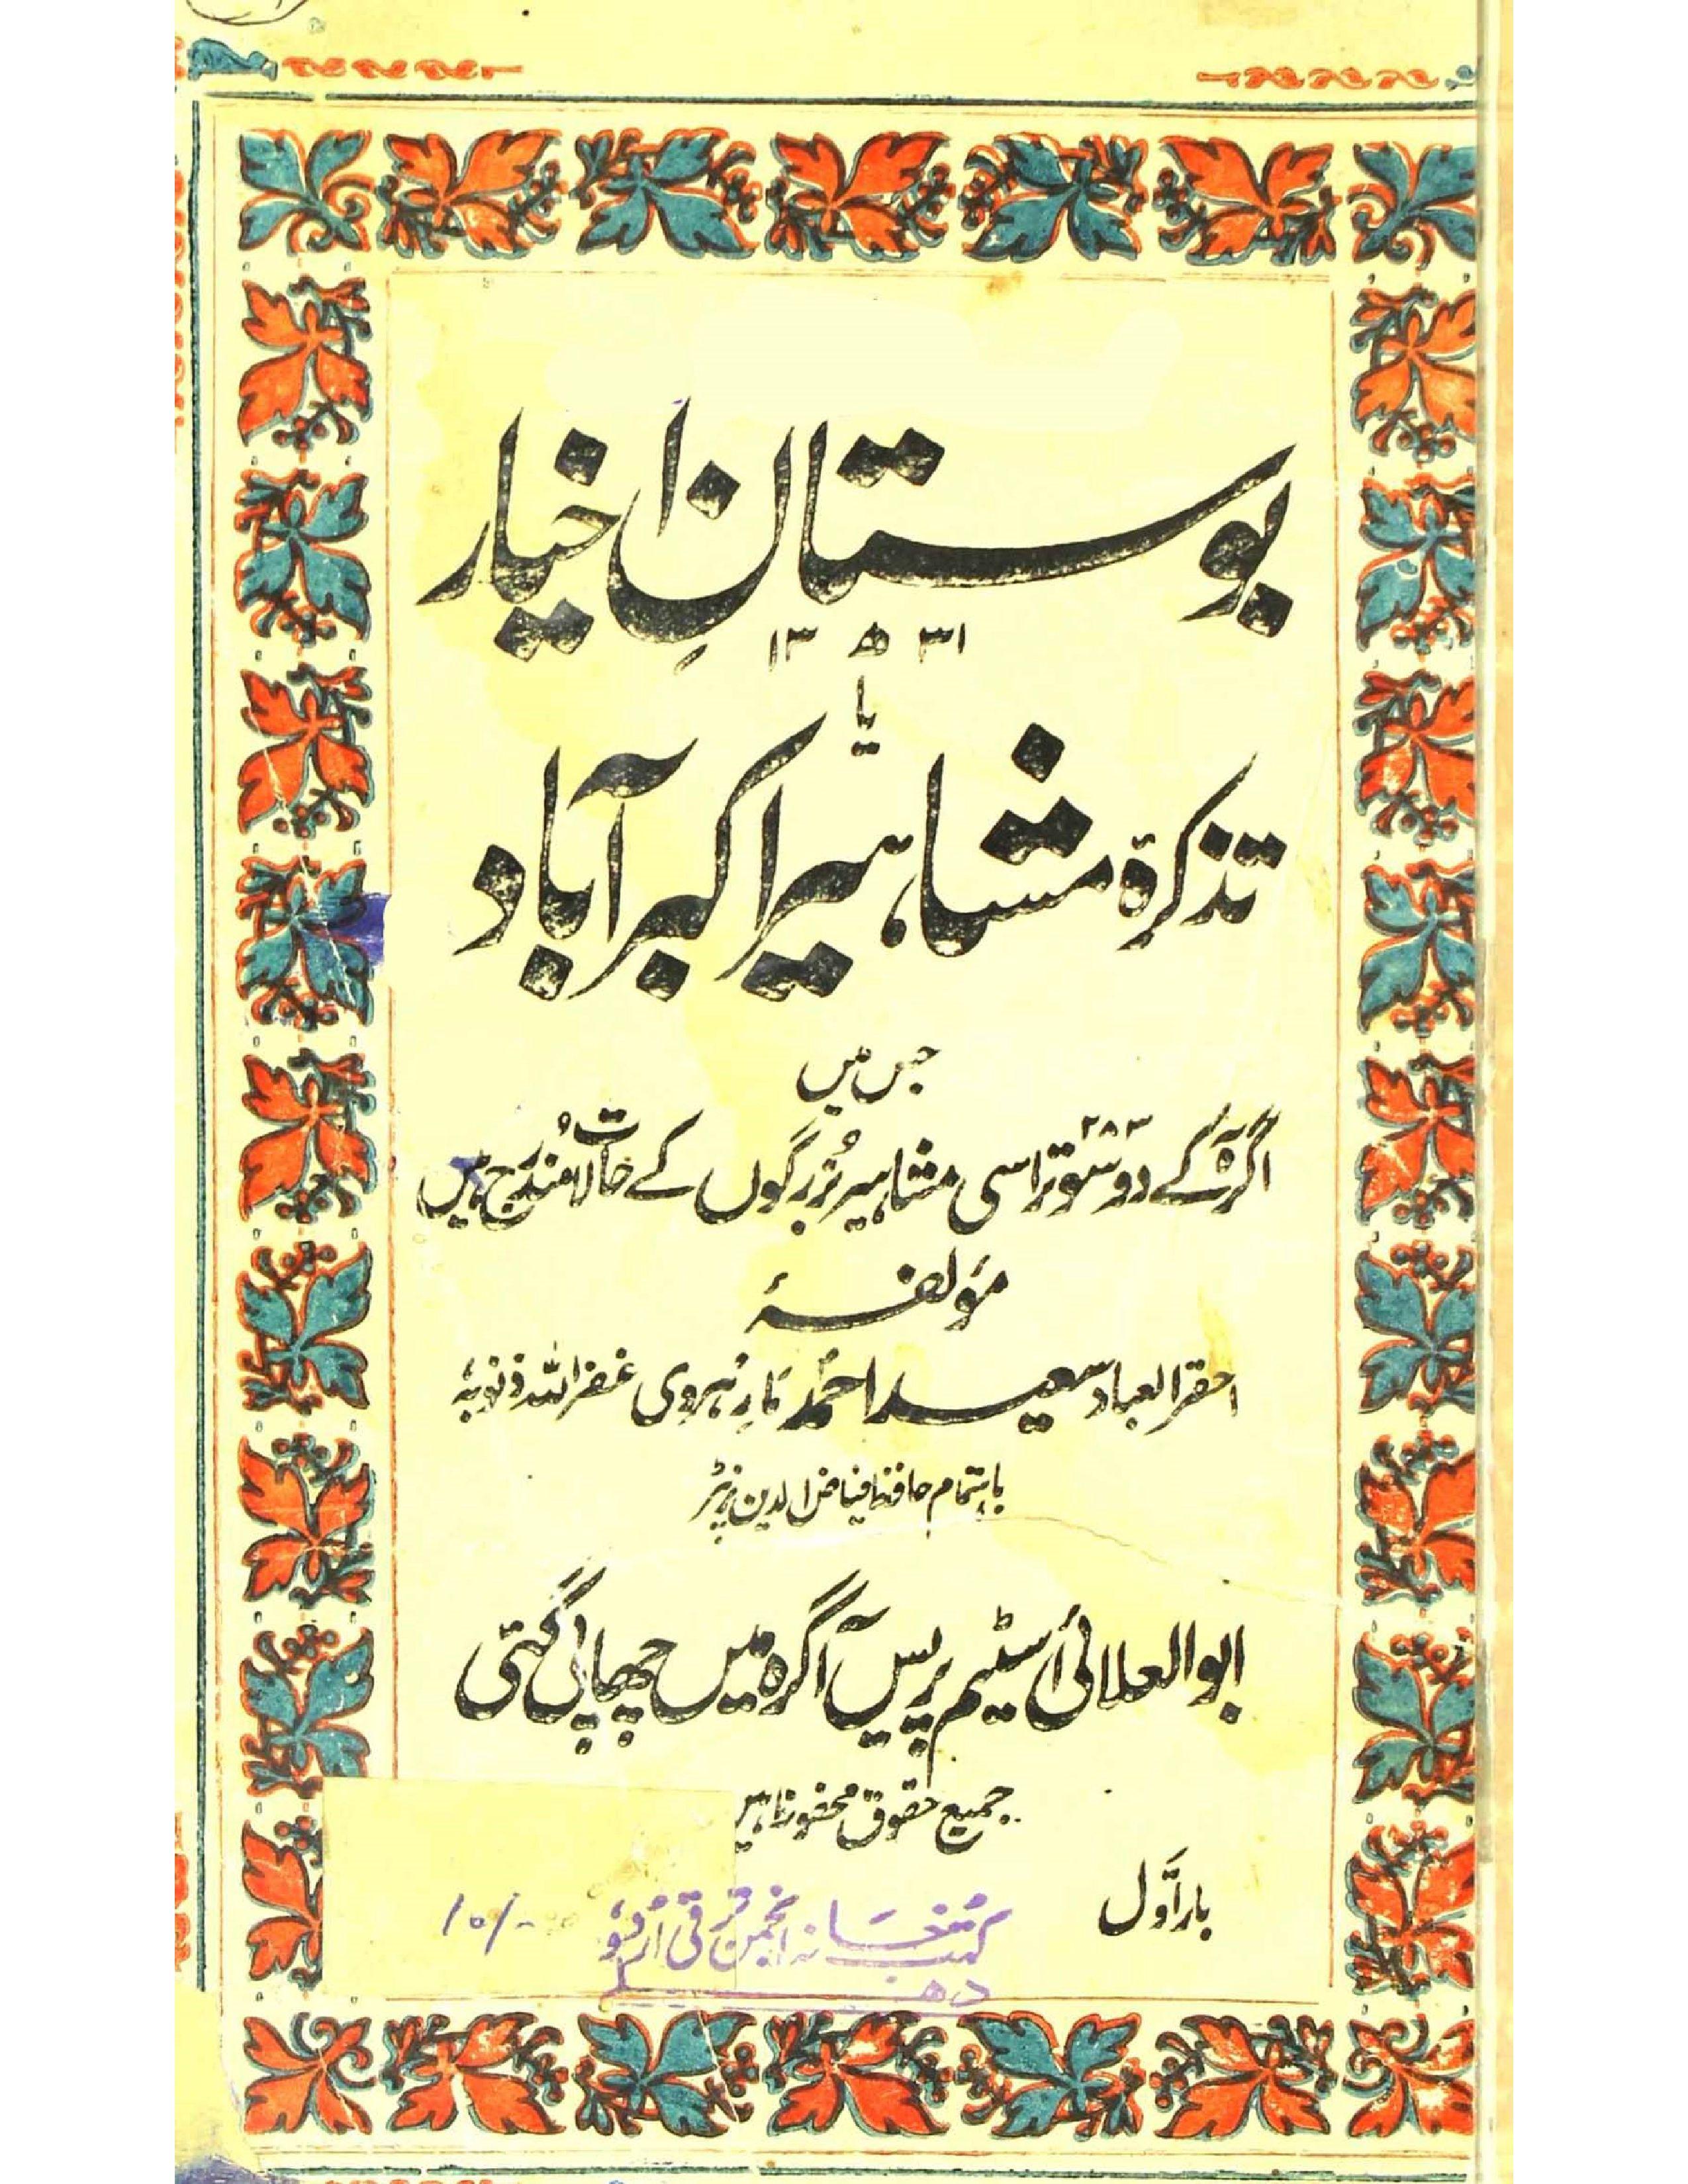 Bostan-e-Akhyaar     Tazkira-e-Mashaheer-e-Akbarabad